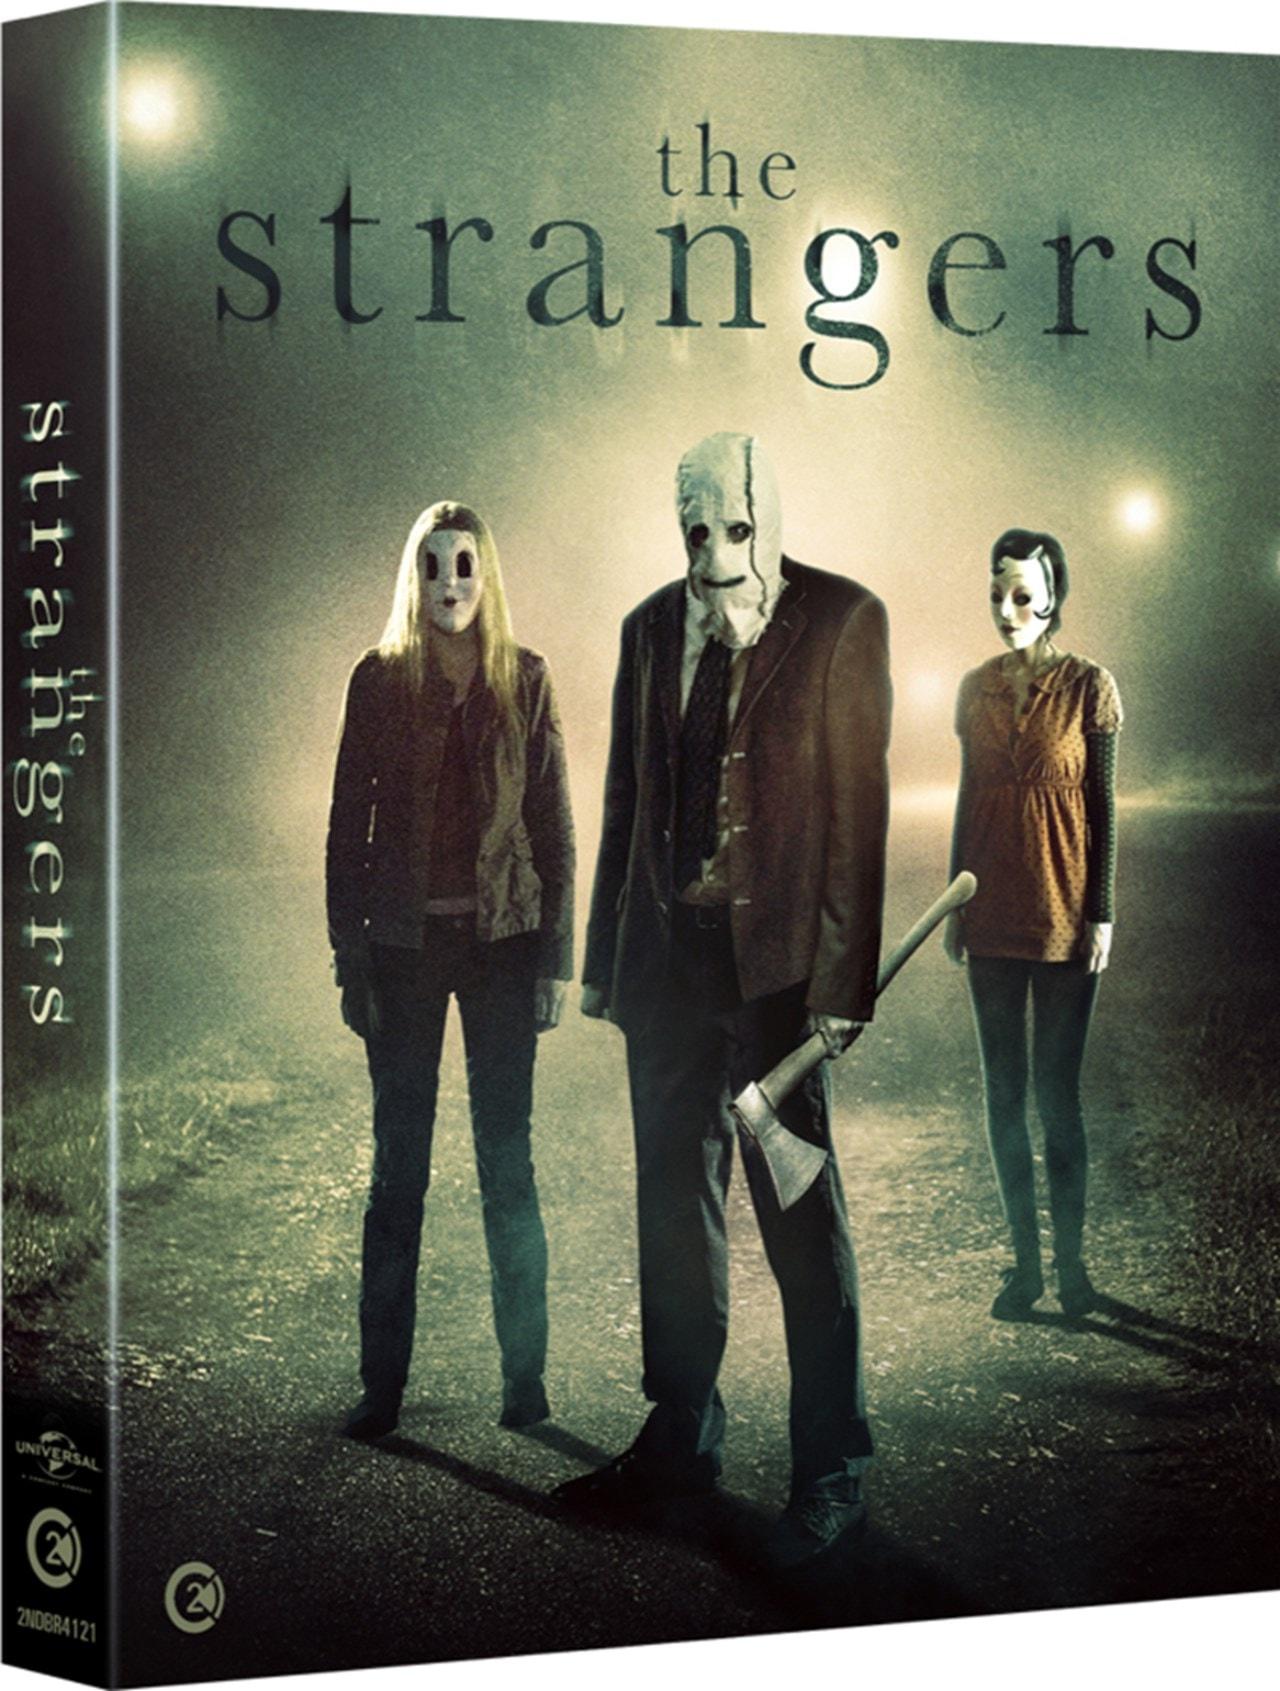 The Strangers - 1